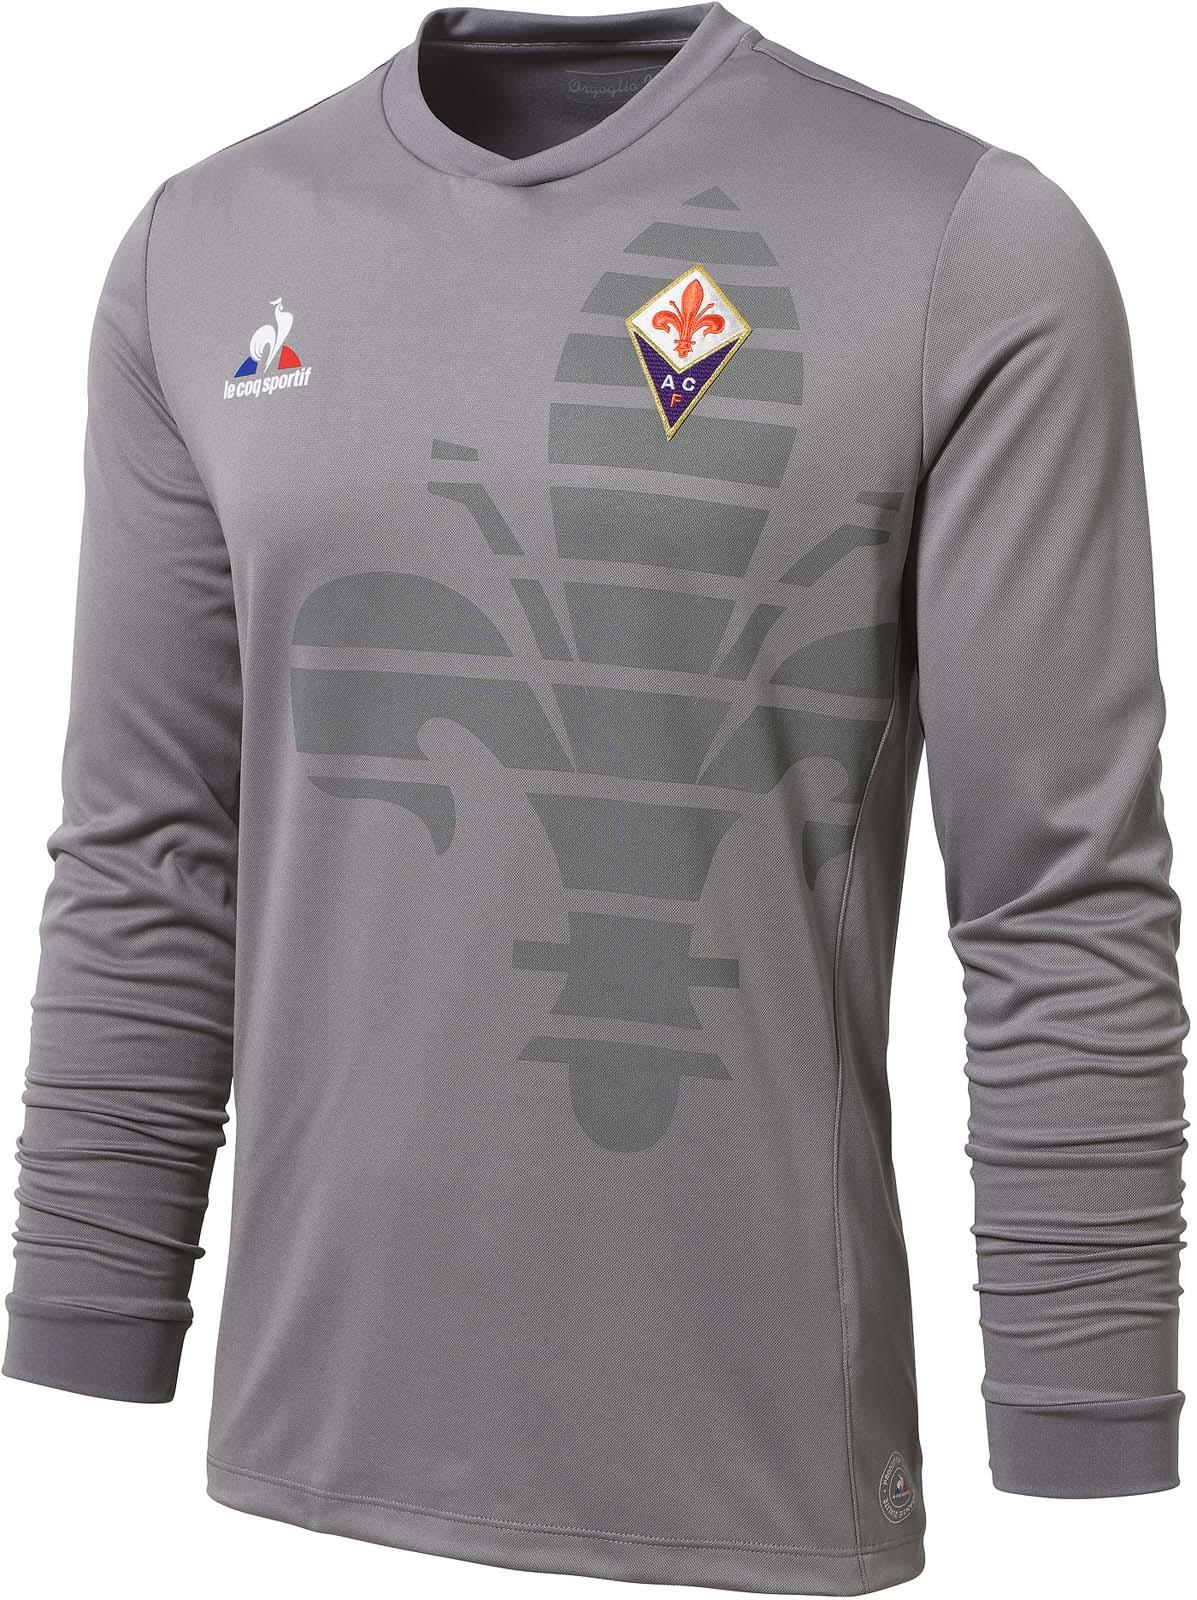 Le-Coq-Sportif-Fiorentina-15-16-Goalkeeper-Kit (6) – Forza27 473284a4e